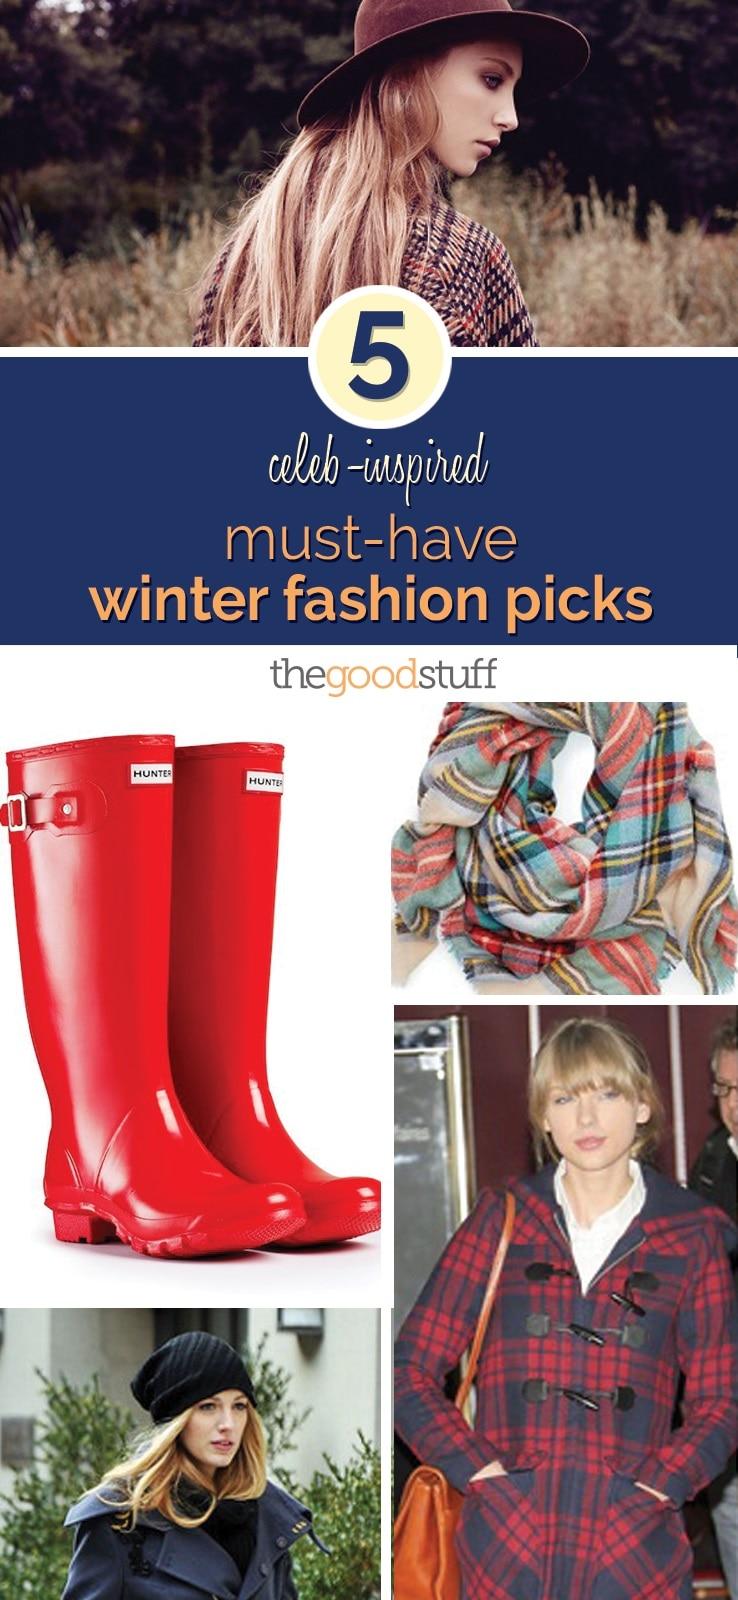 style-celeb-winter-fashion